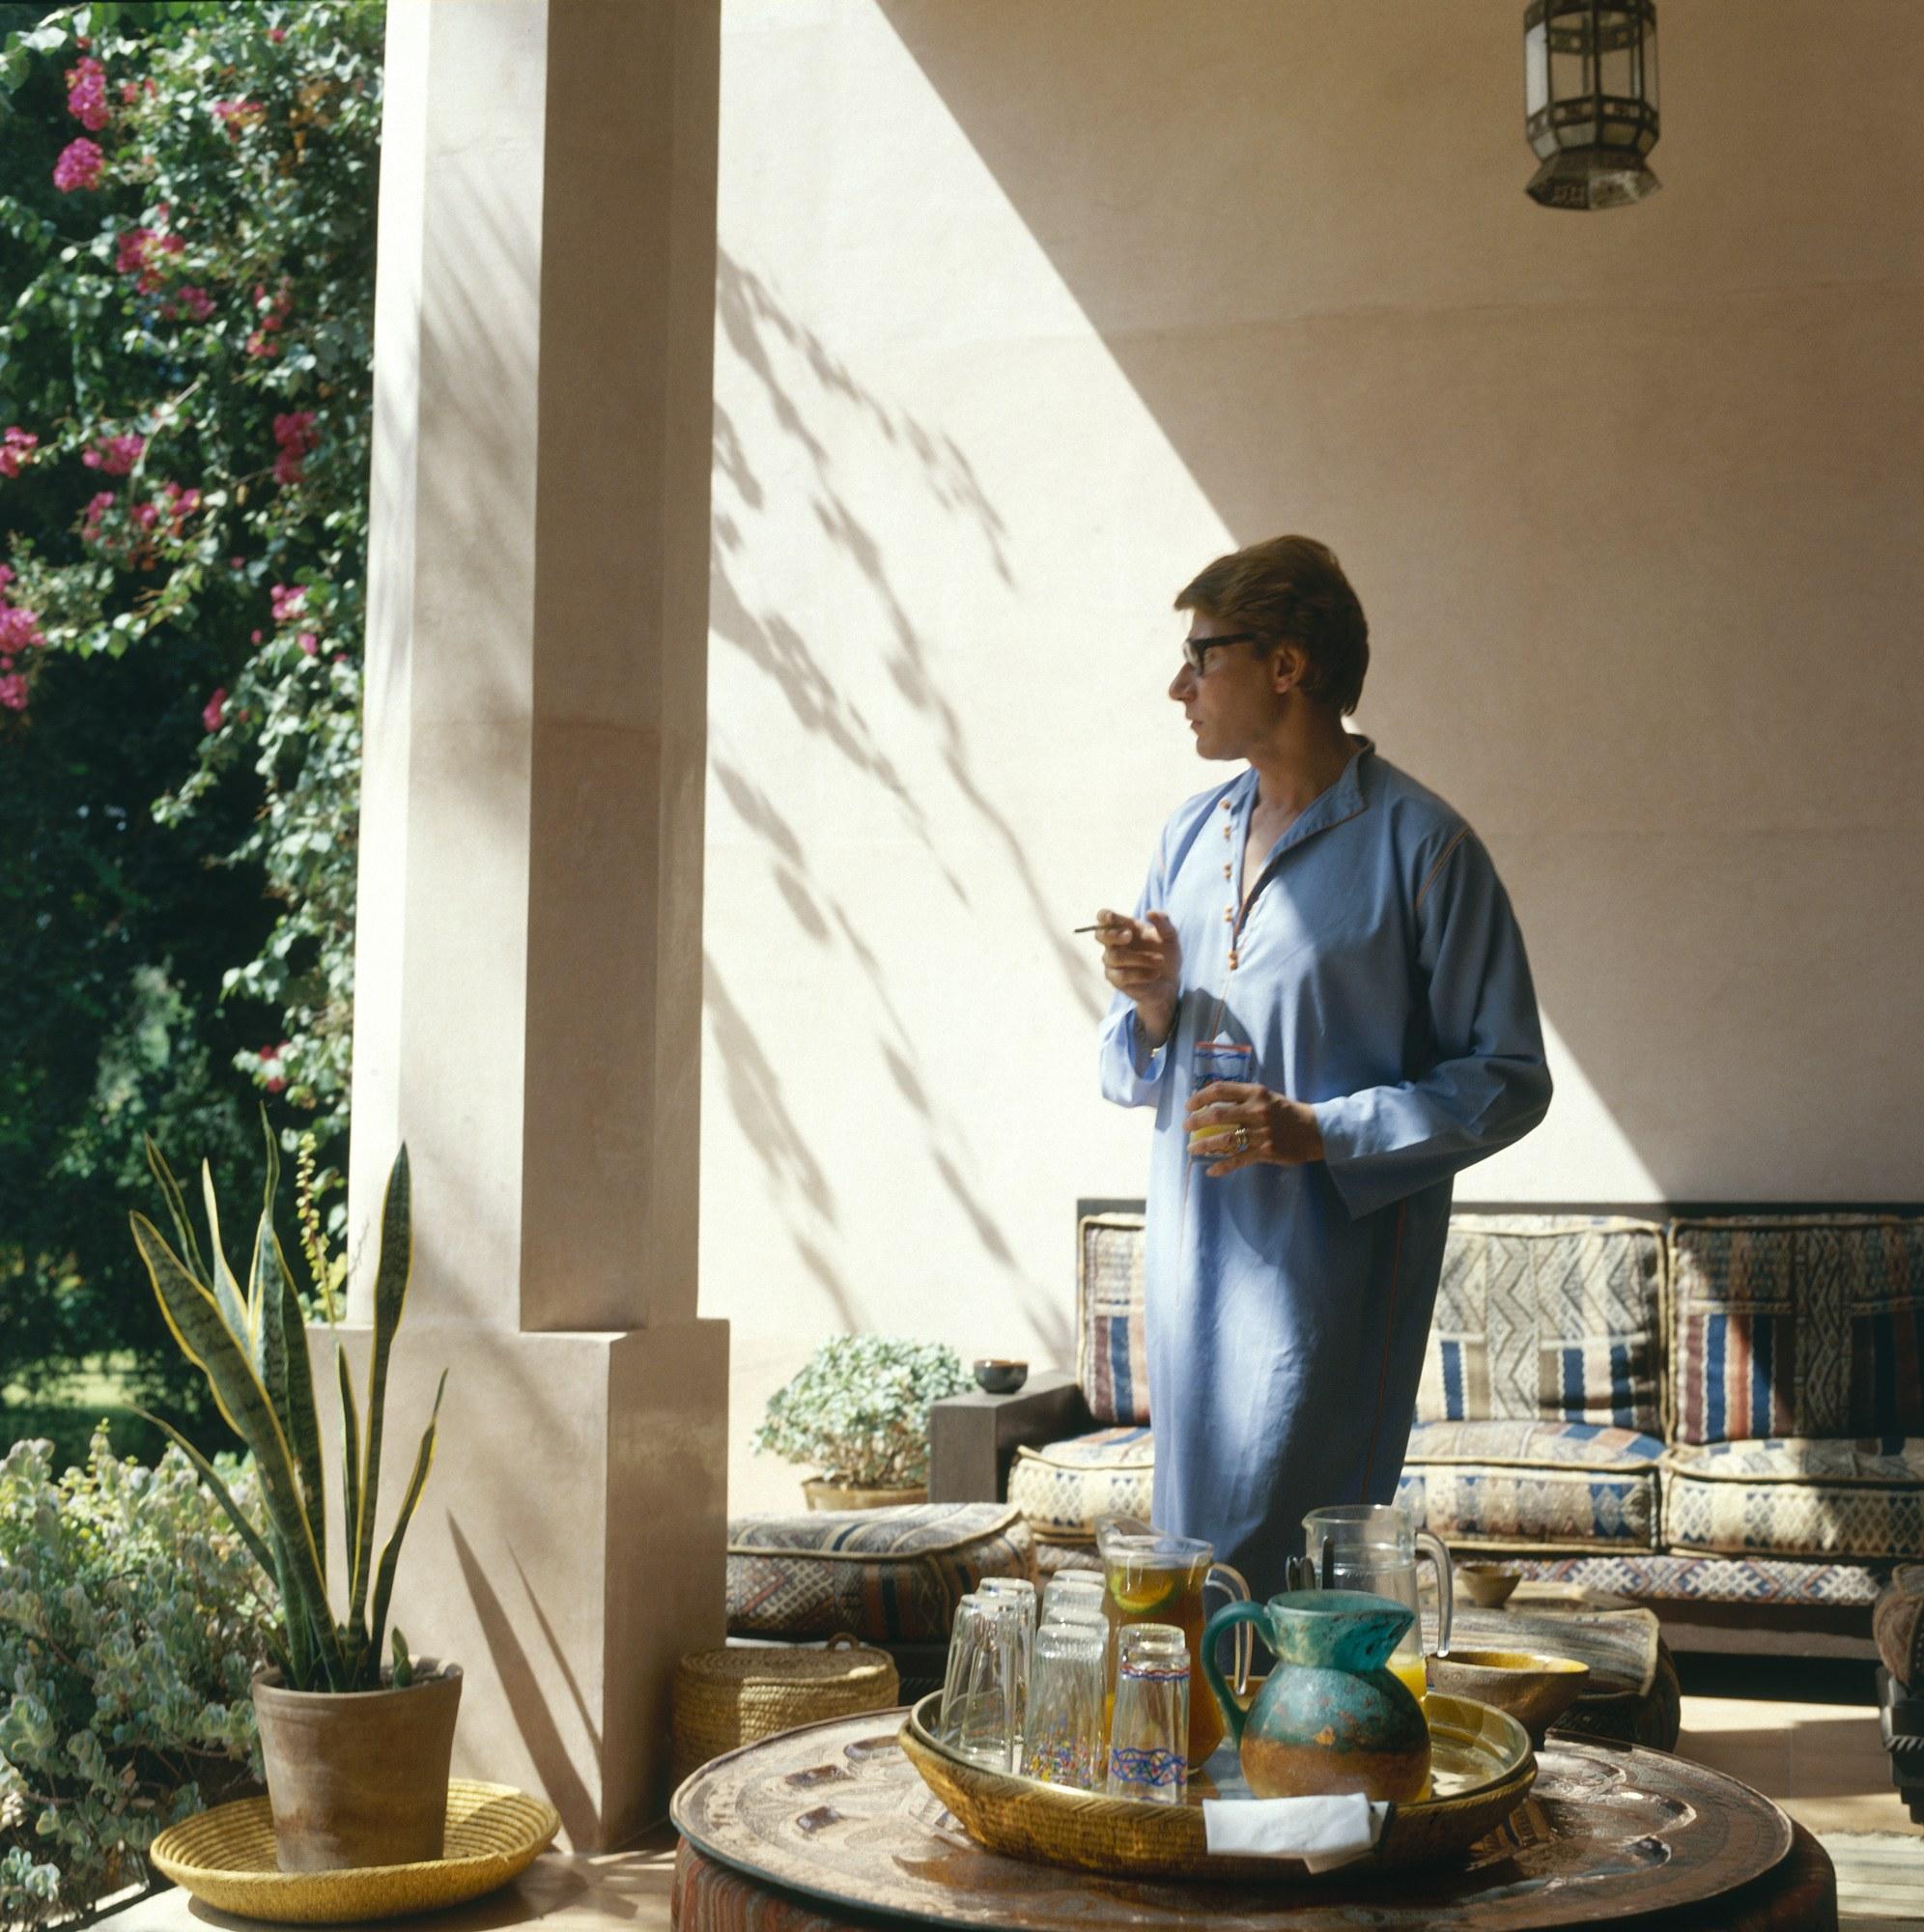 mus e yves saint laurent marrakech set for opening in. Black Bedroom Furniture Sets. Home Design Ideas